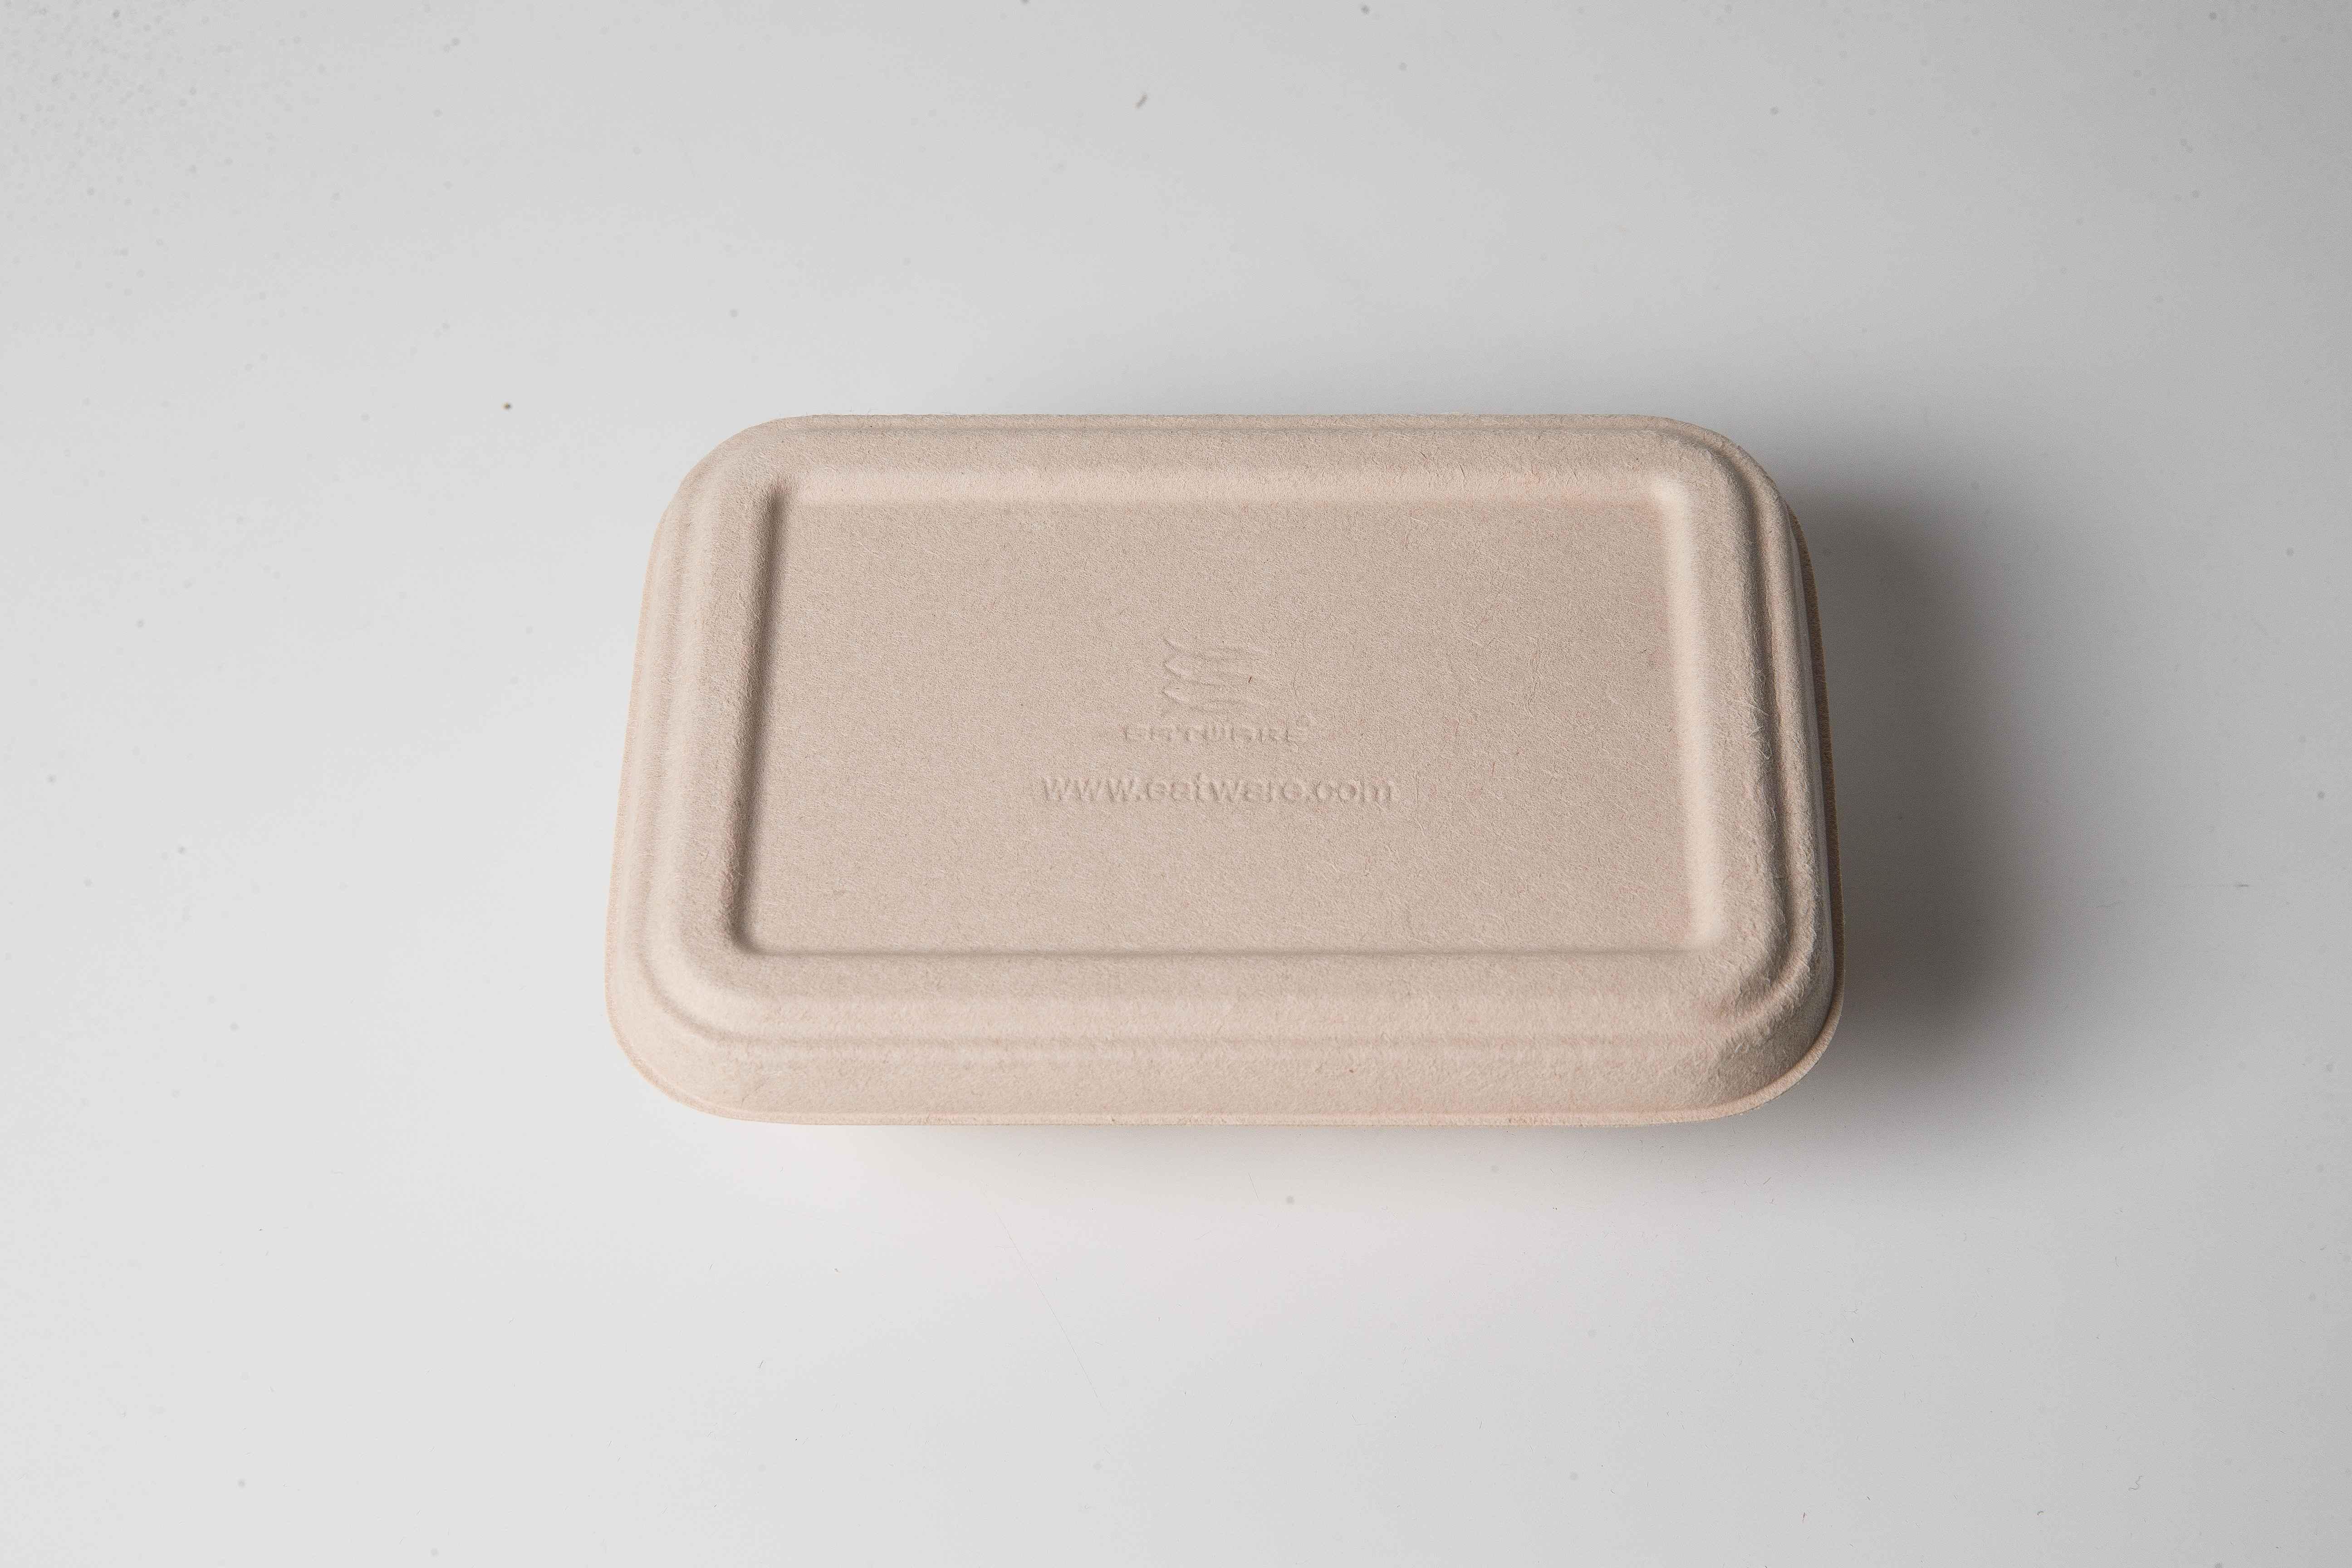 6.15x4.25寸盒蓋-L156xW108xH12